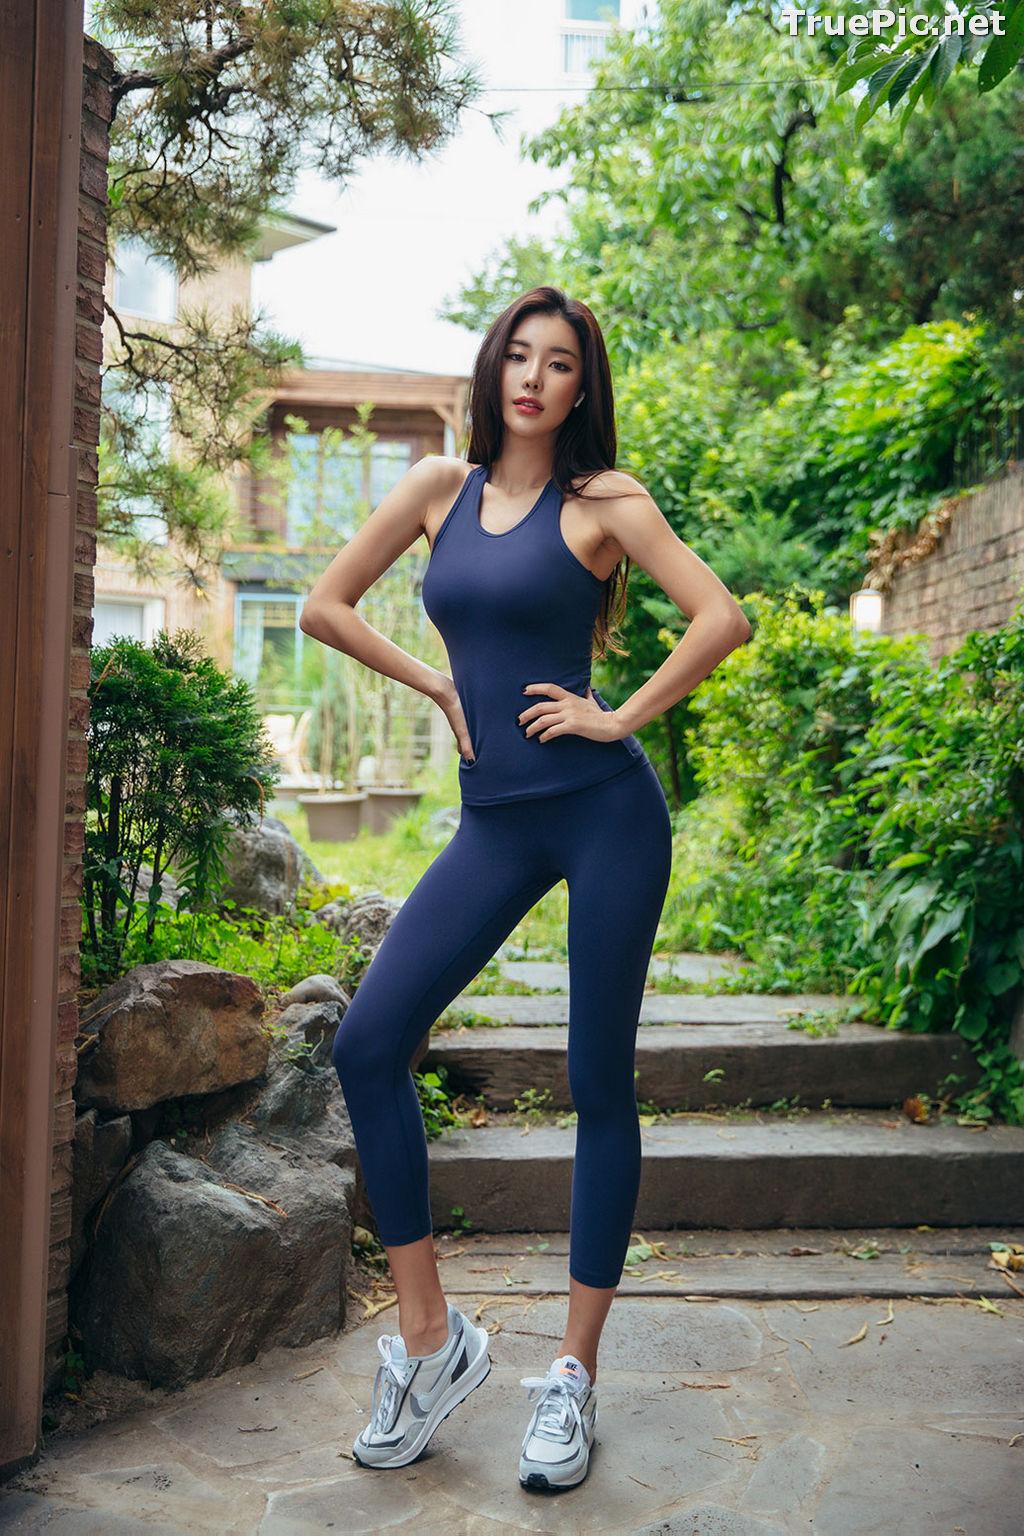 Image Korean Fashion Model - Park Da Hyun - Navy Sportswear - TruePic.net - Picture-6